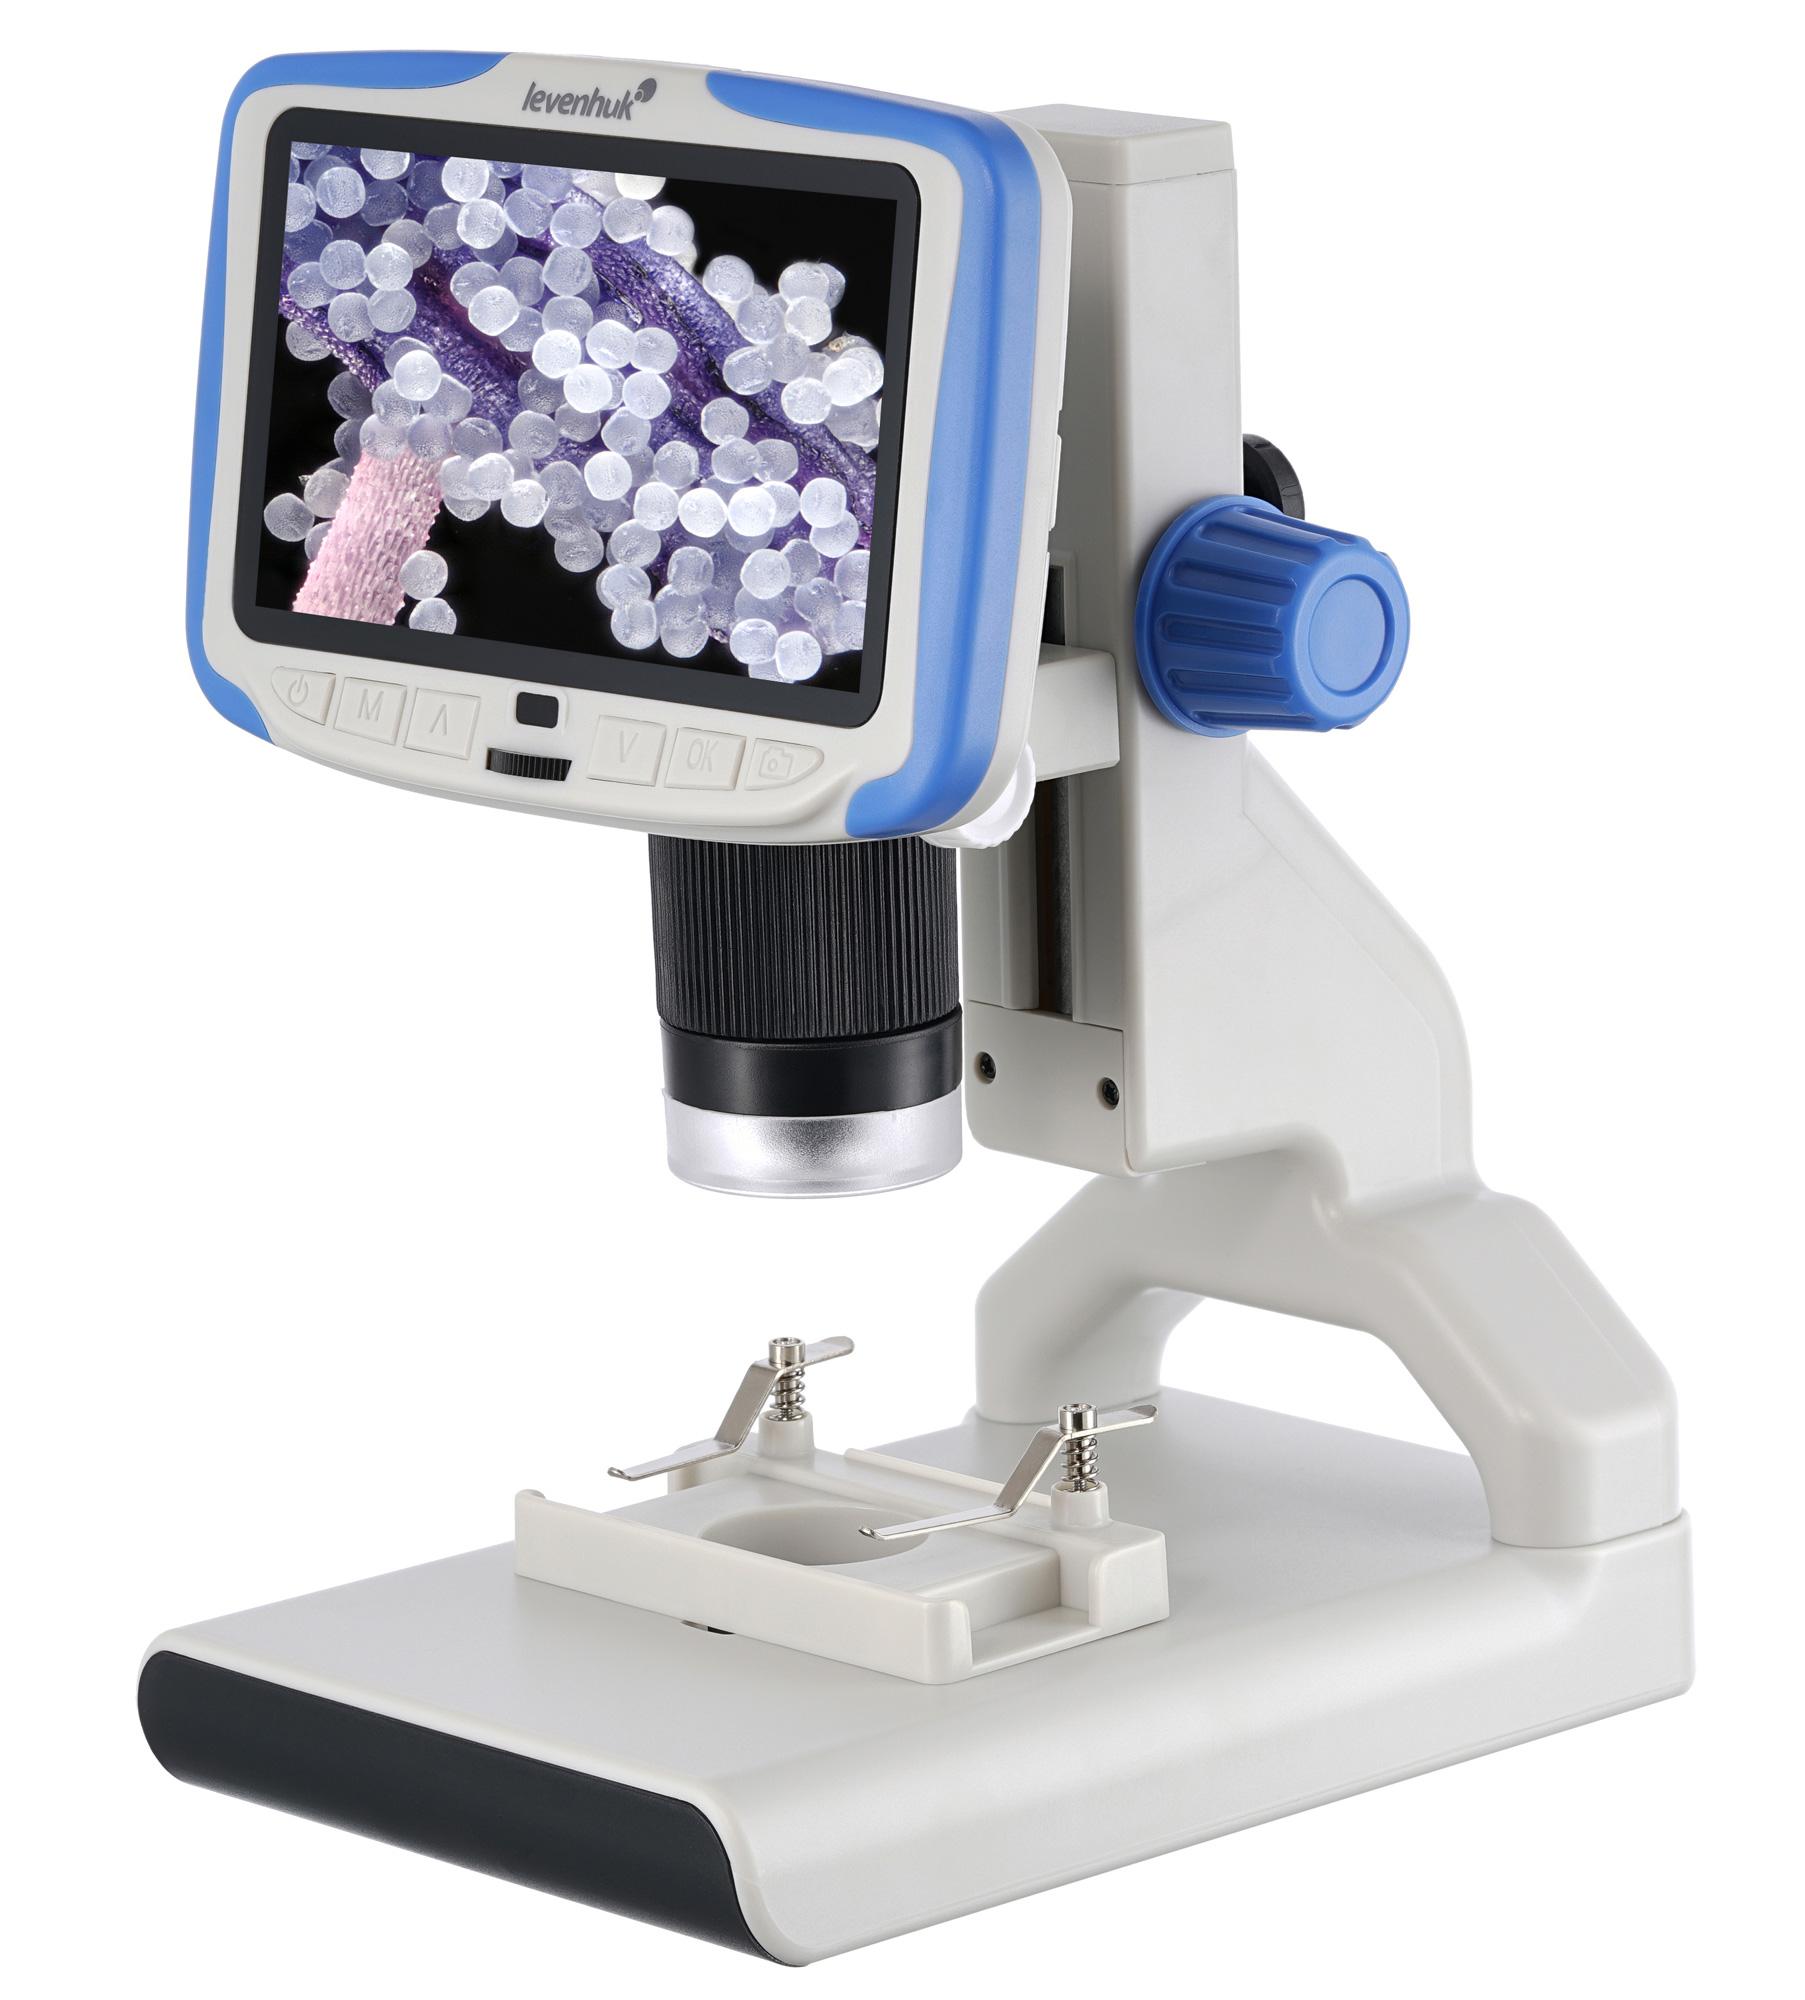 Microscopio digitale Levenhuk Rainbow DM500 LCD